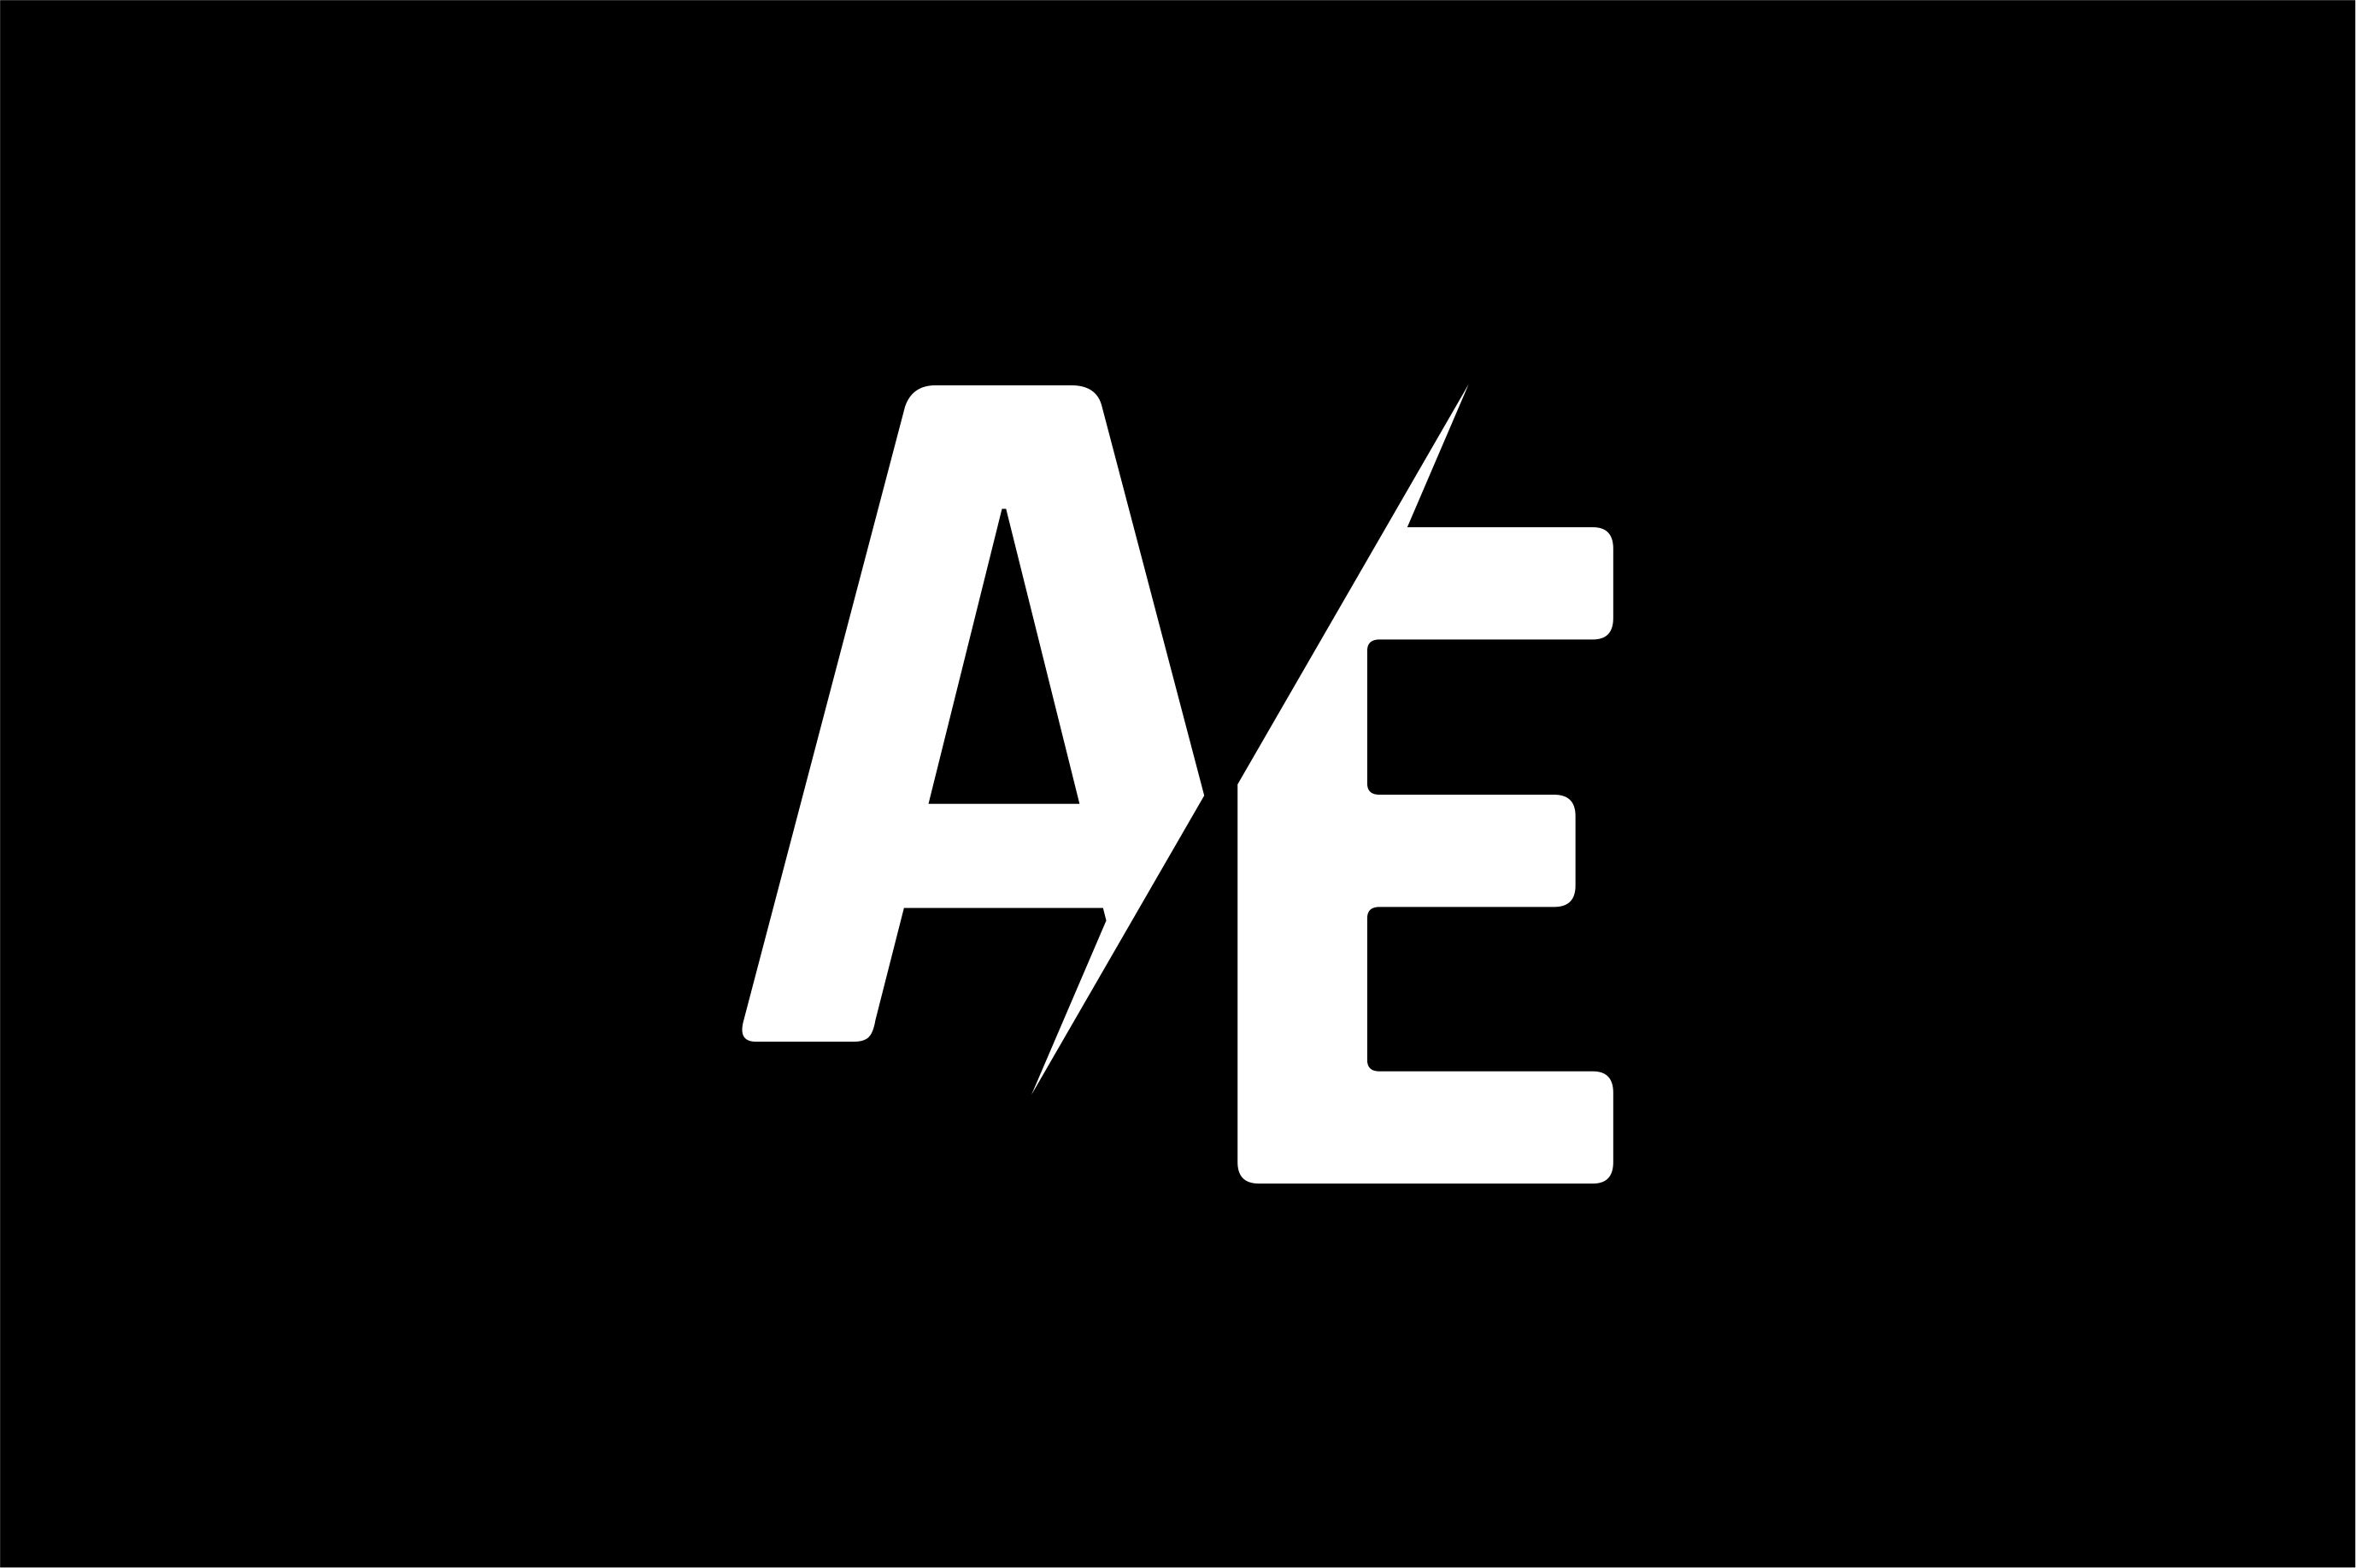 Monogram Ae Logo Design Logos Design Lettering Design Logos